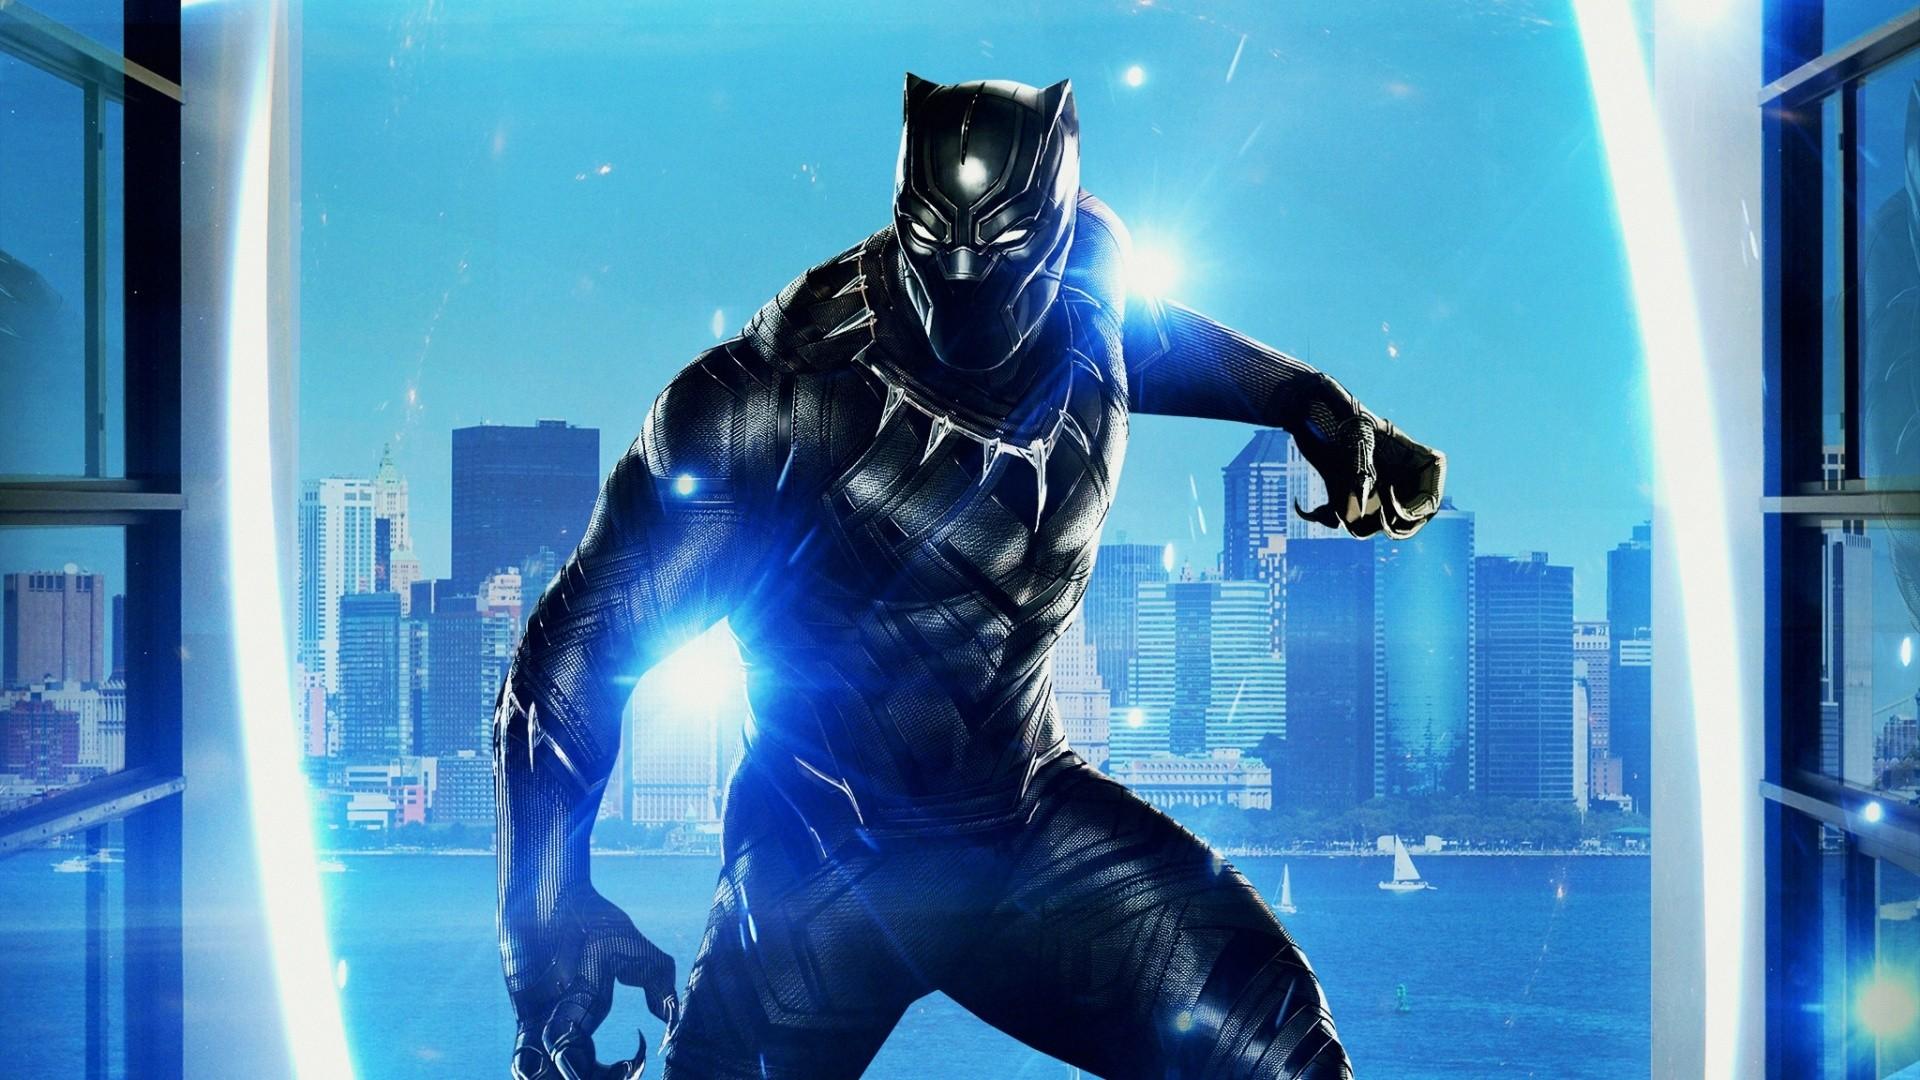 Black Panther a wallpaper